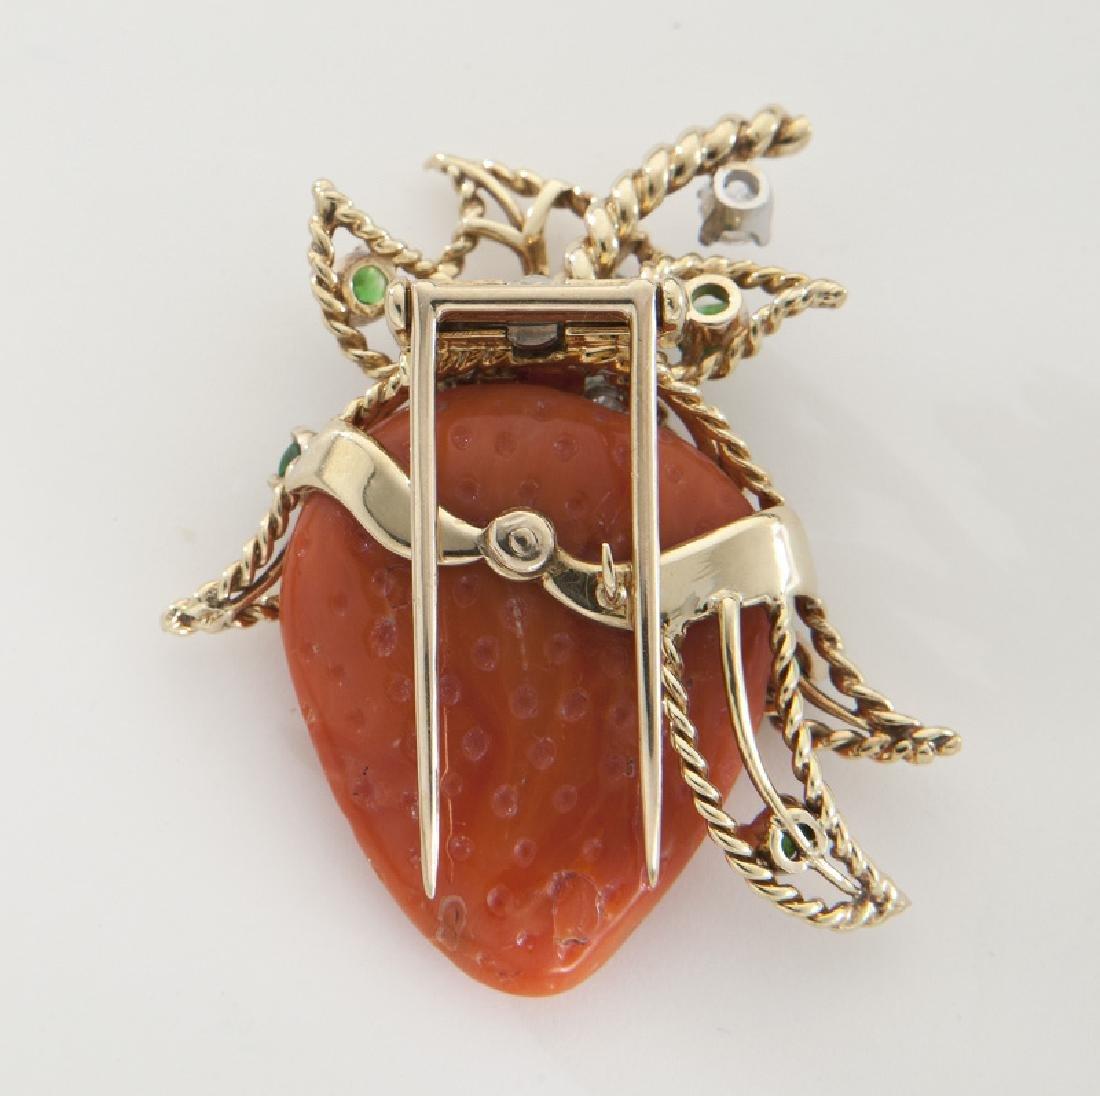 Deco/Retro 18K, diamond, garnet and coral brooch - 2